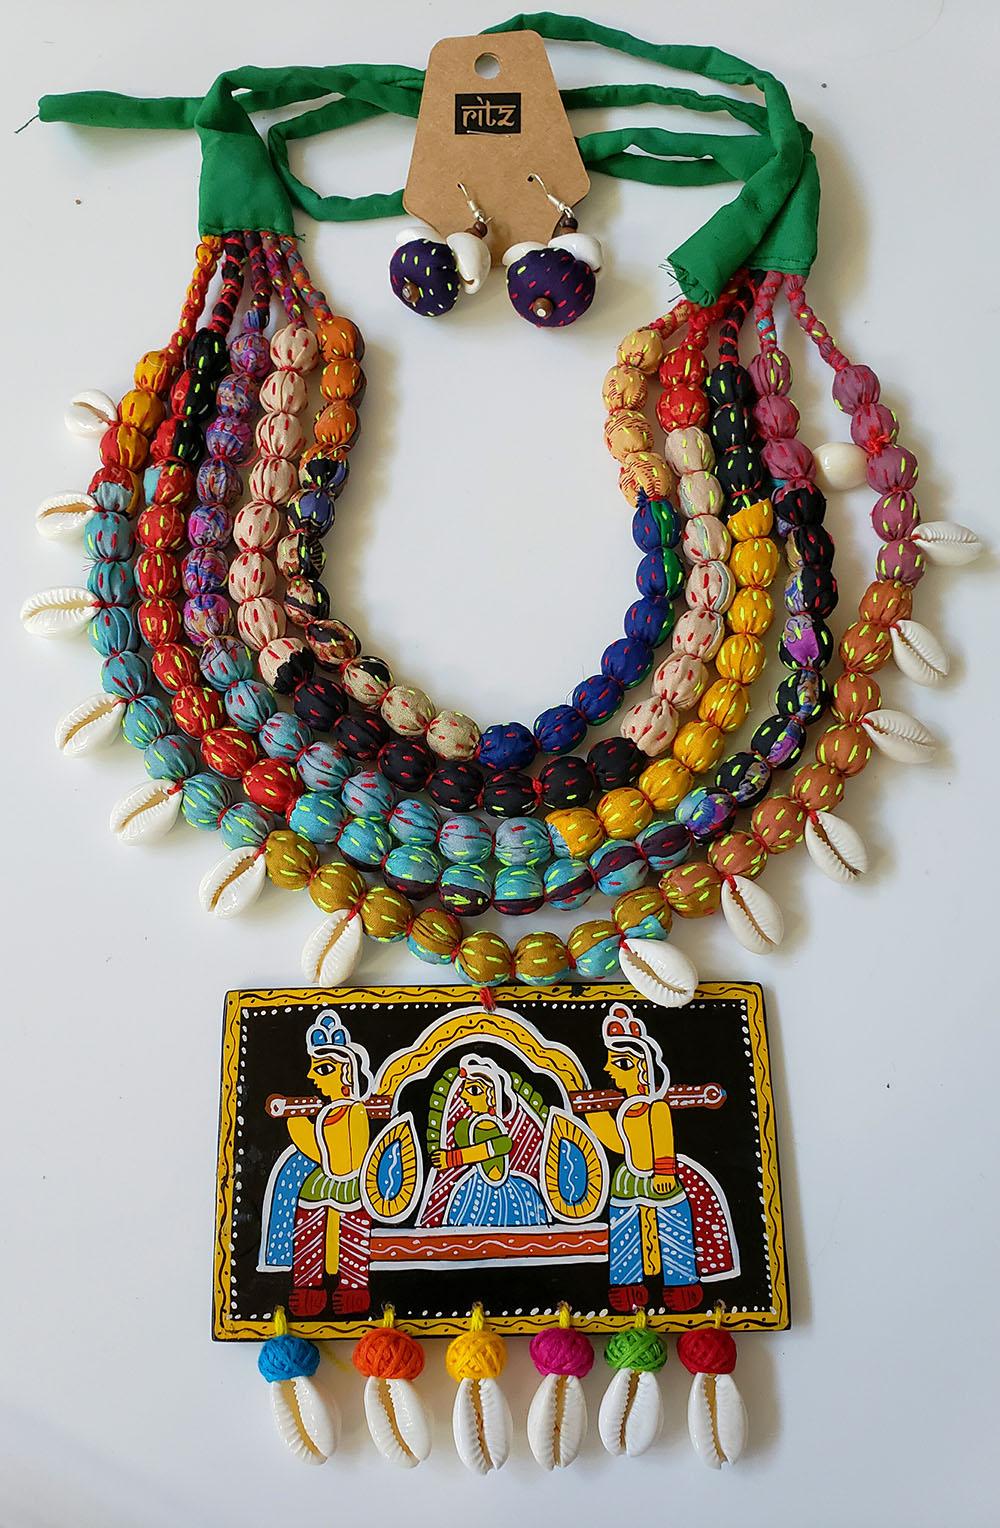 Tikuli Art Fabric Jewelry Ritz Fashion Trendz